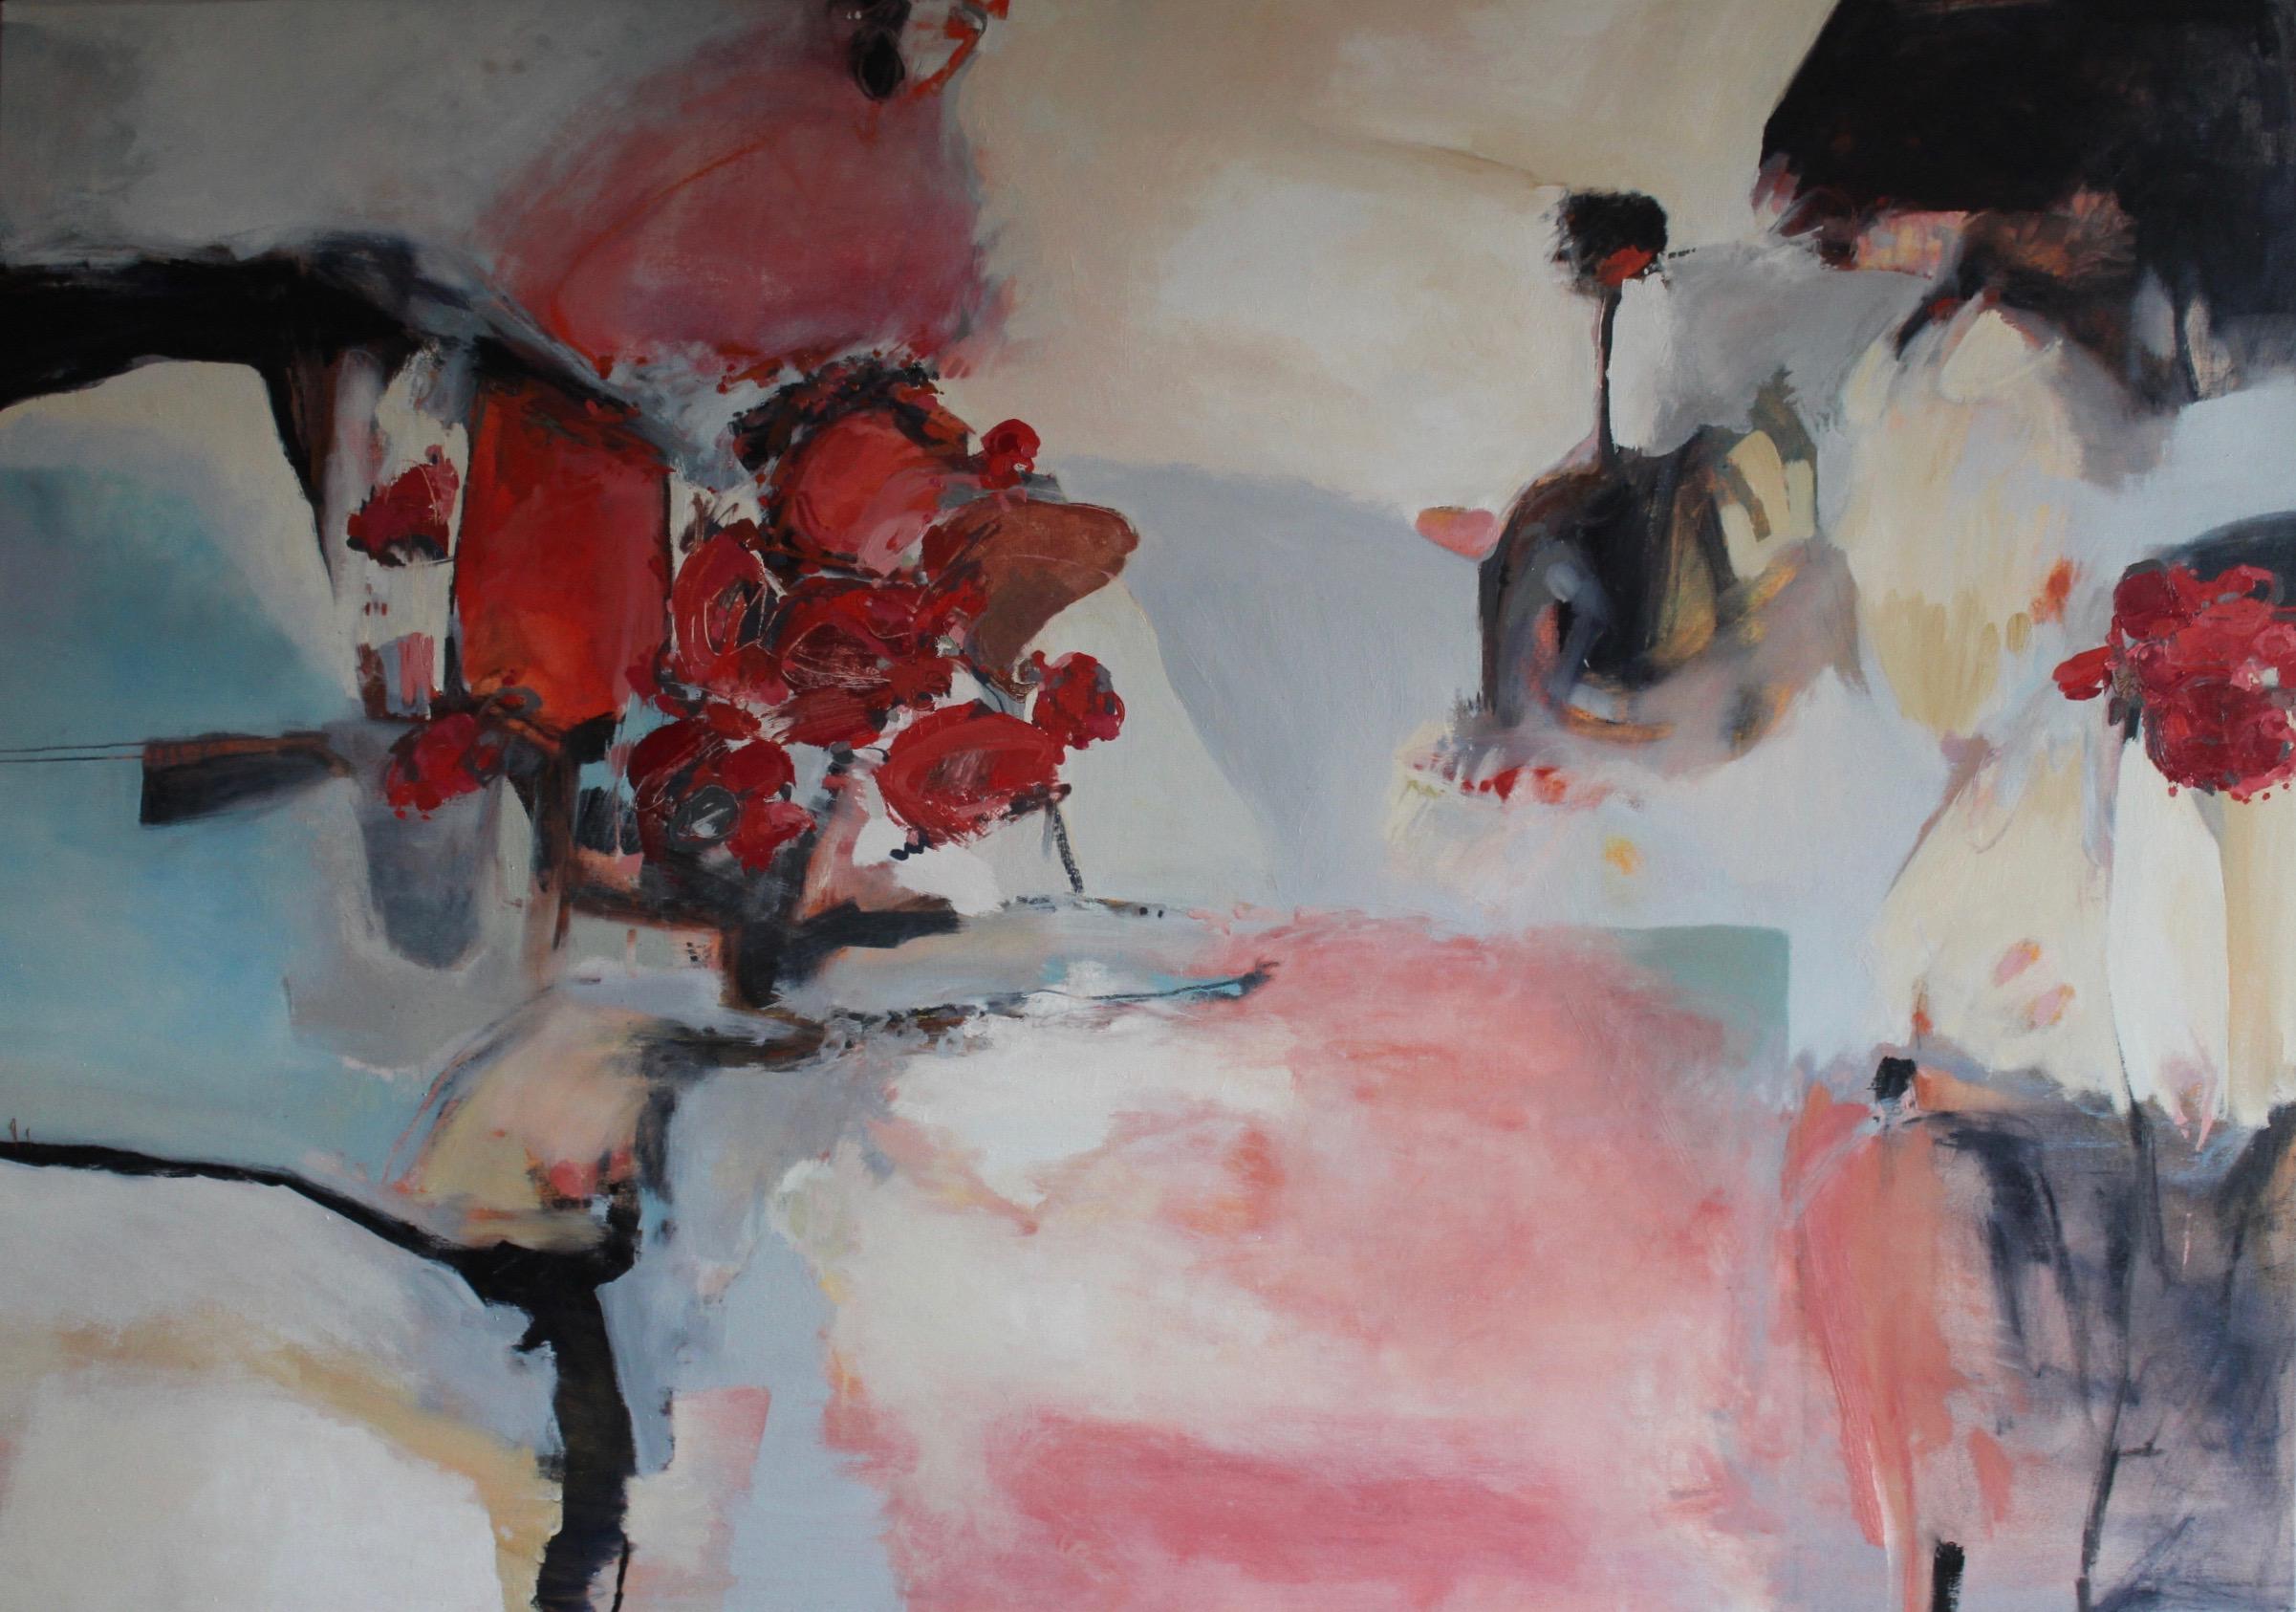 Saint Valentine,2016 / Oil on canvas, 41 x 58 / SOLD